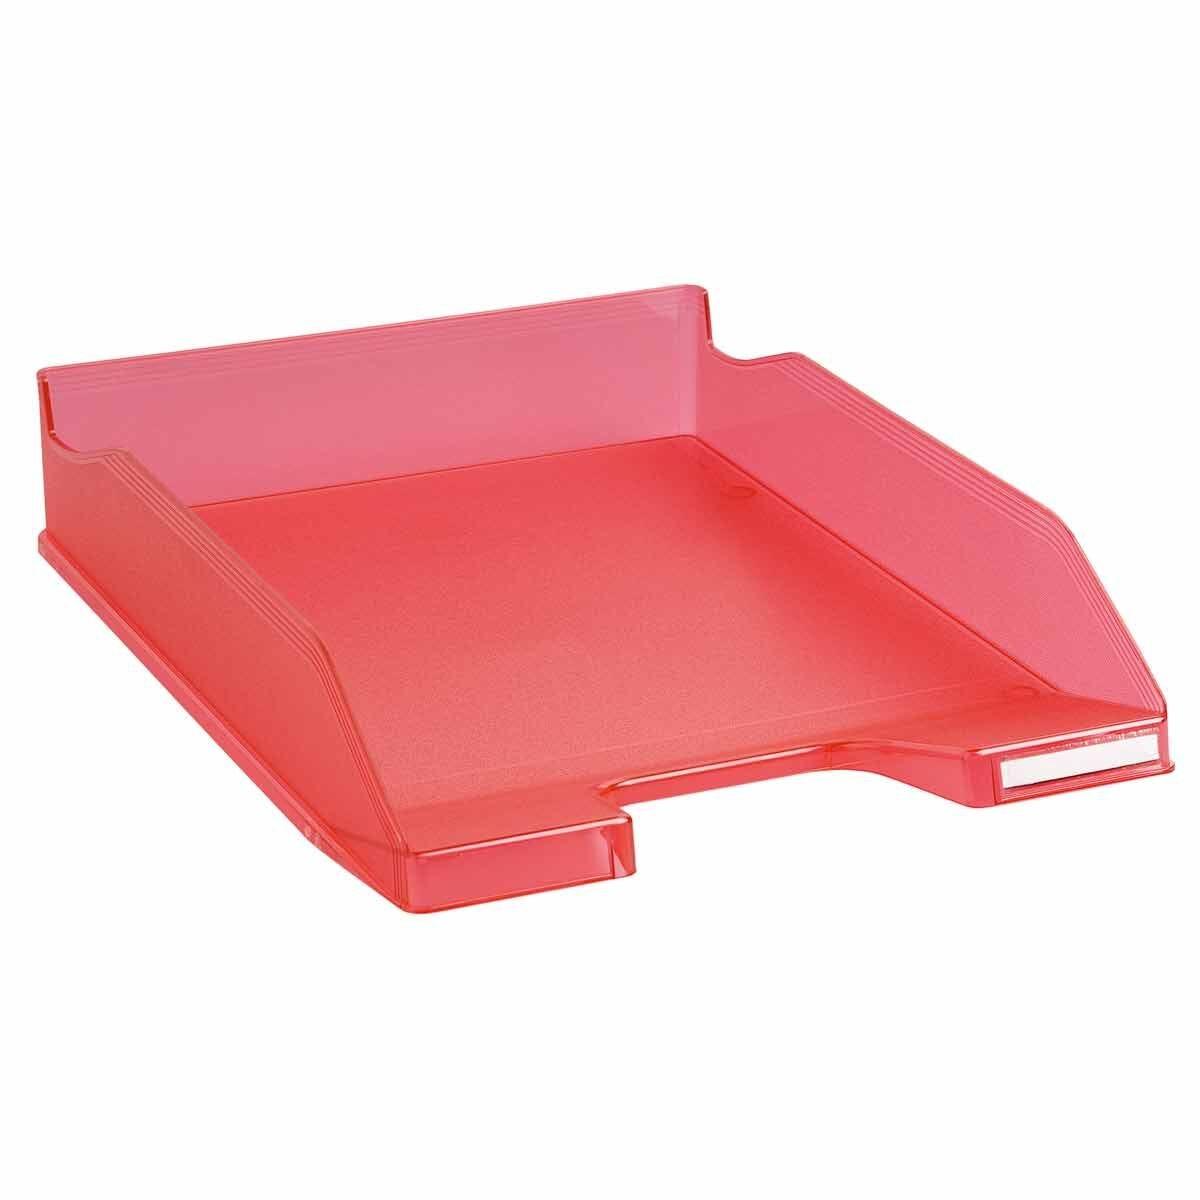 Exacompta Office Letter Tray Midi Combo Pack of 6 Translucent Matte raspberry